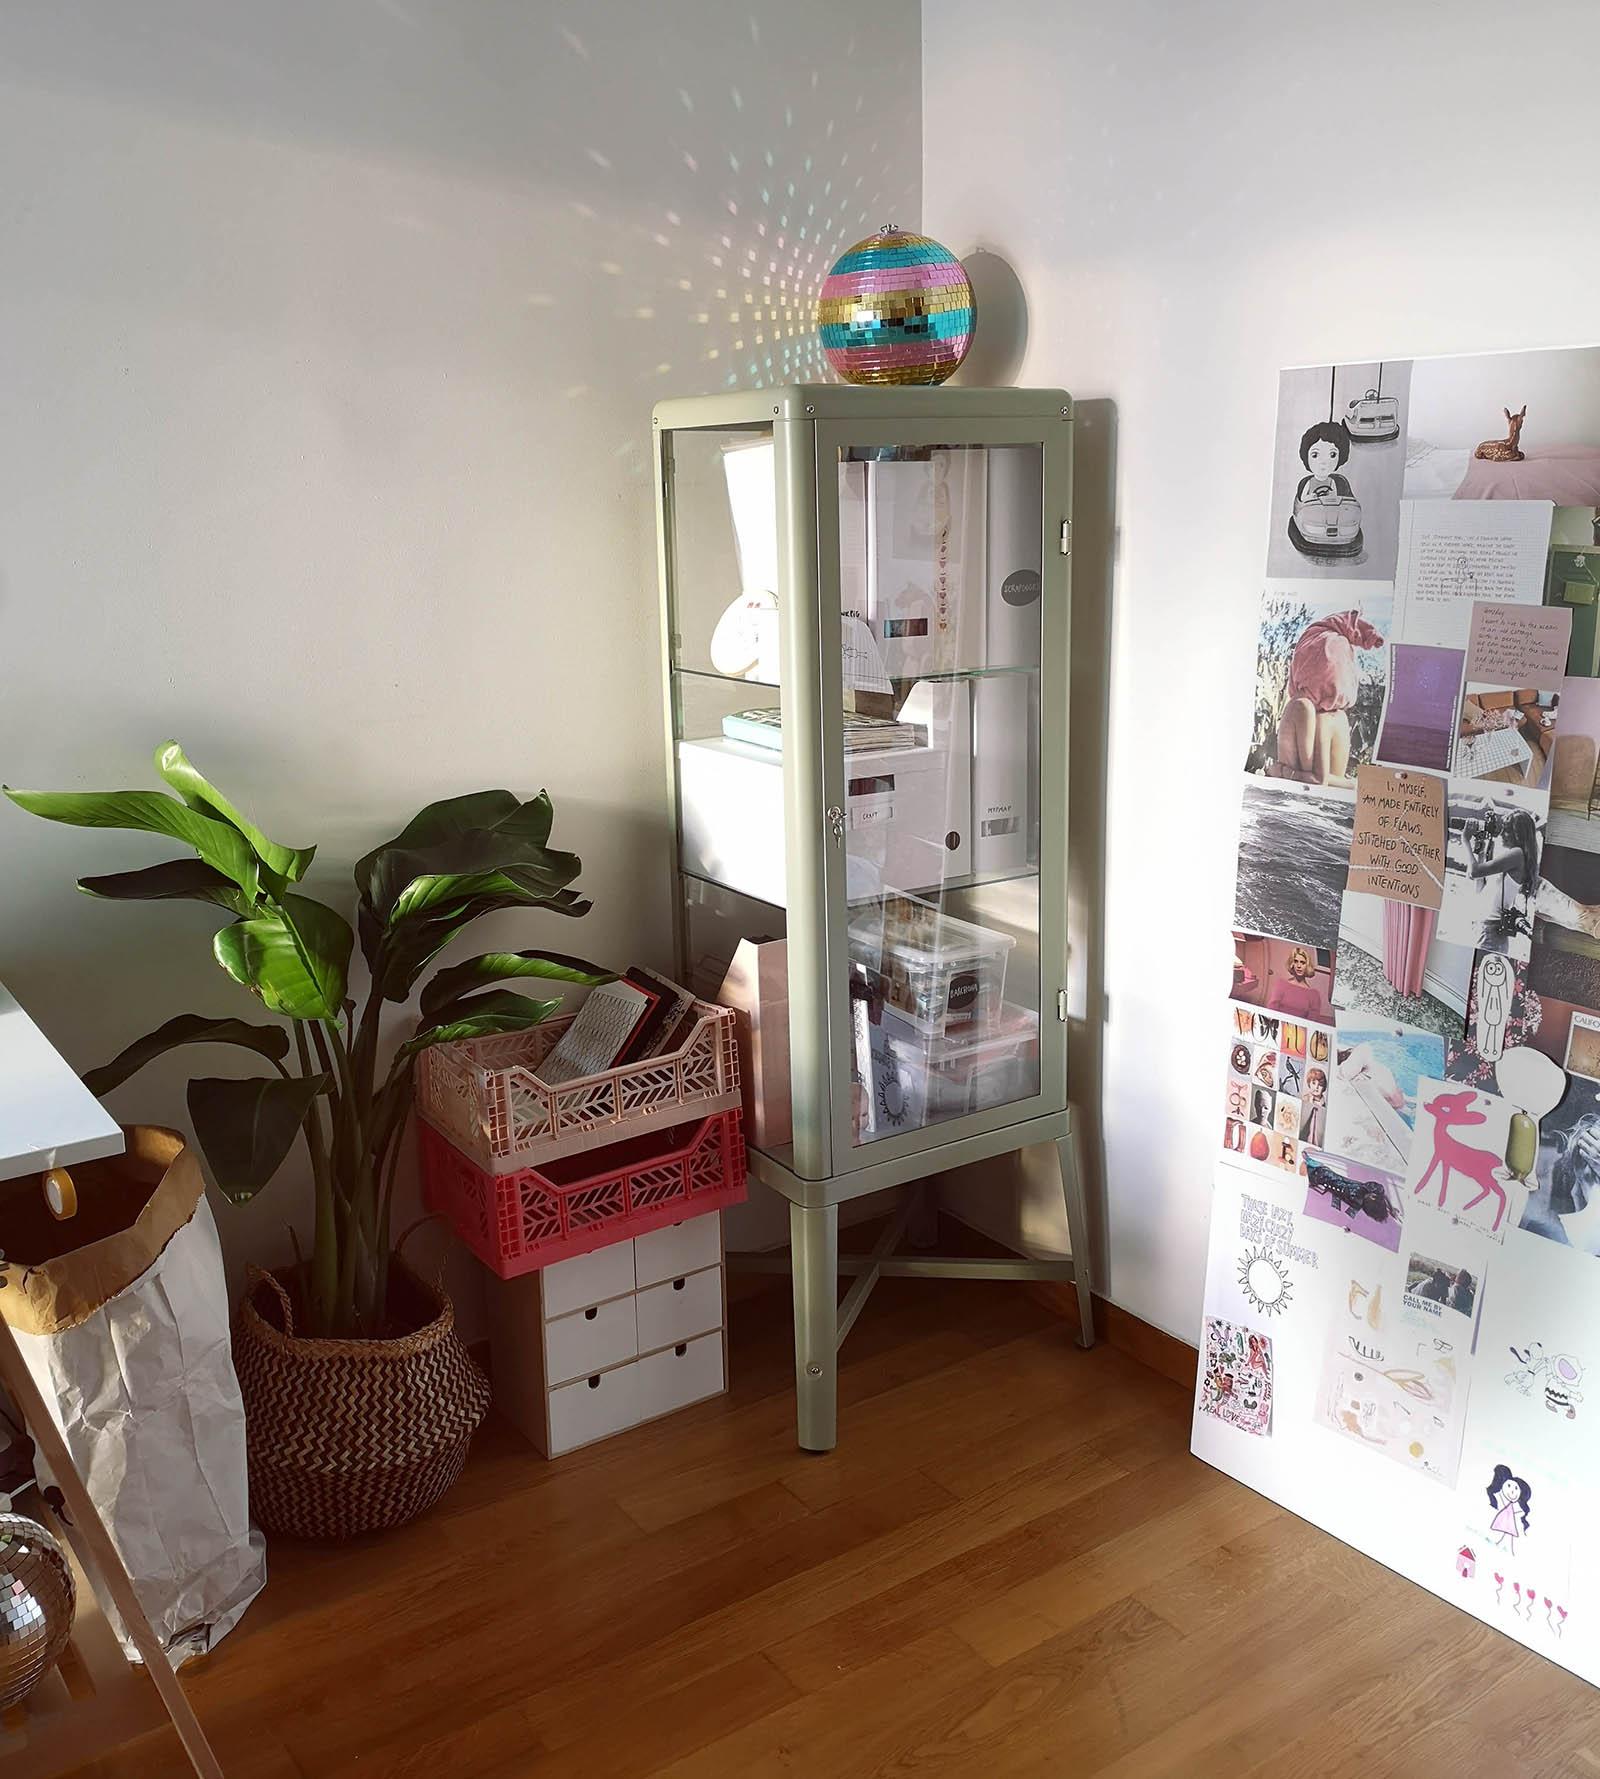 My creative room